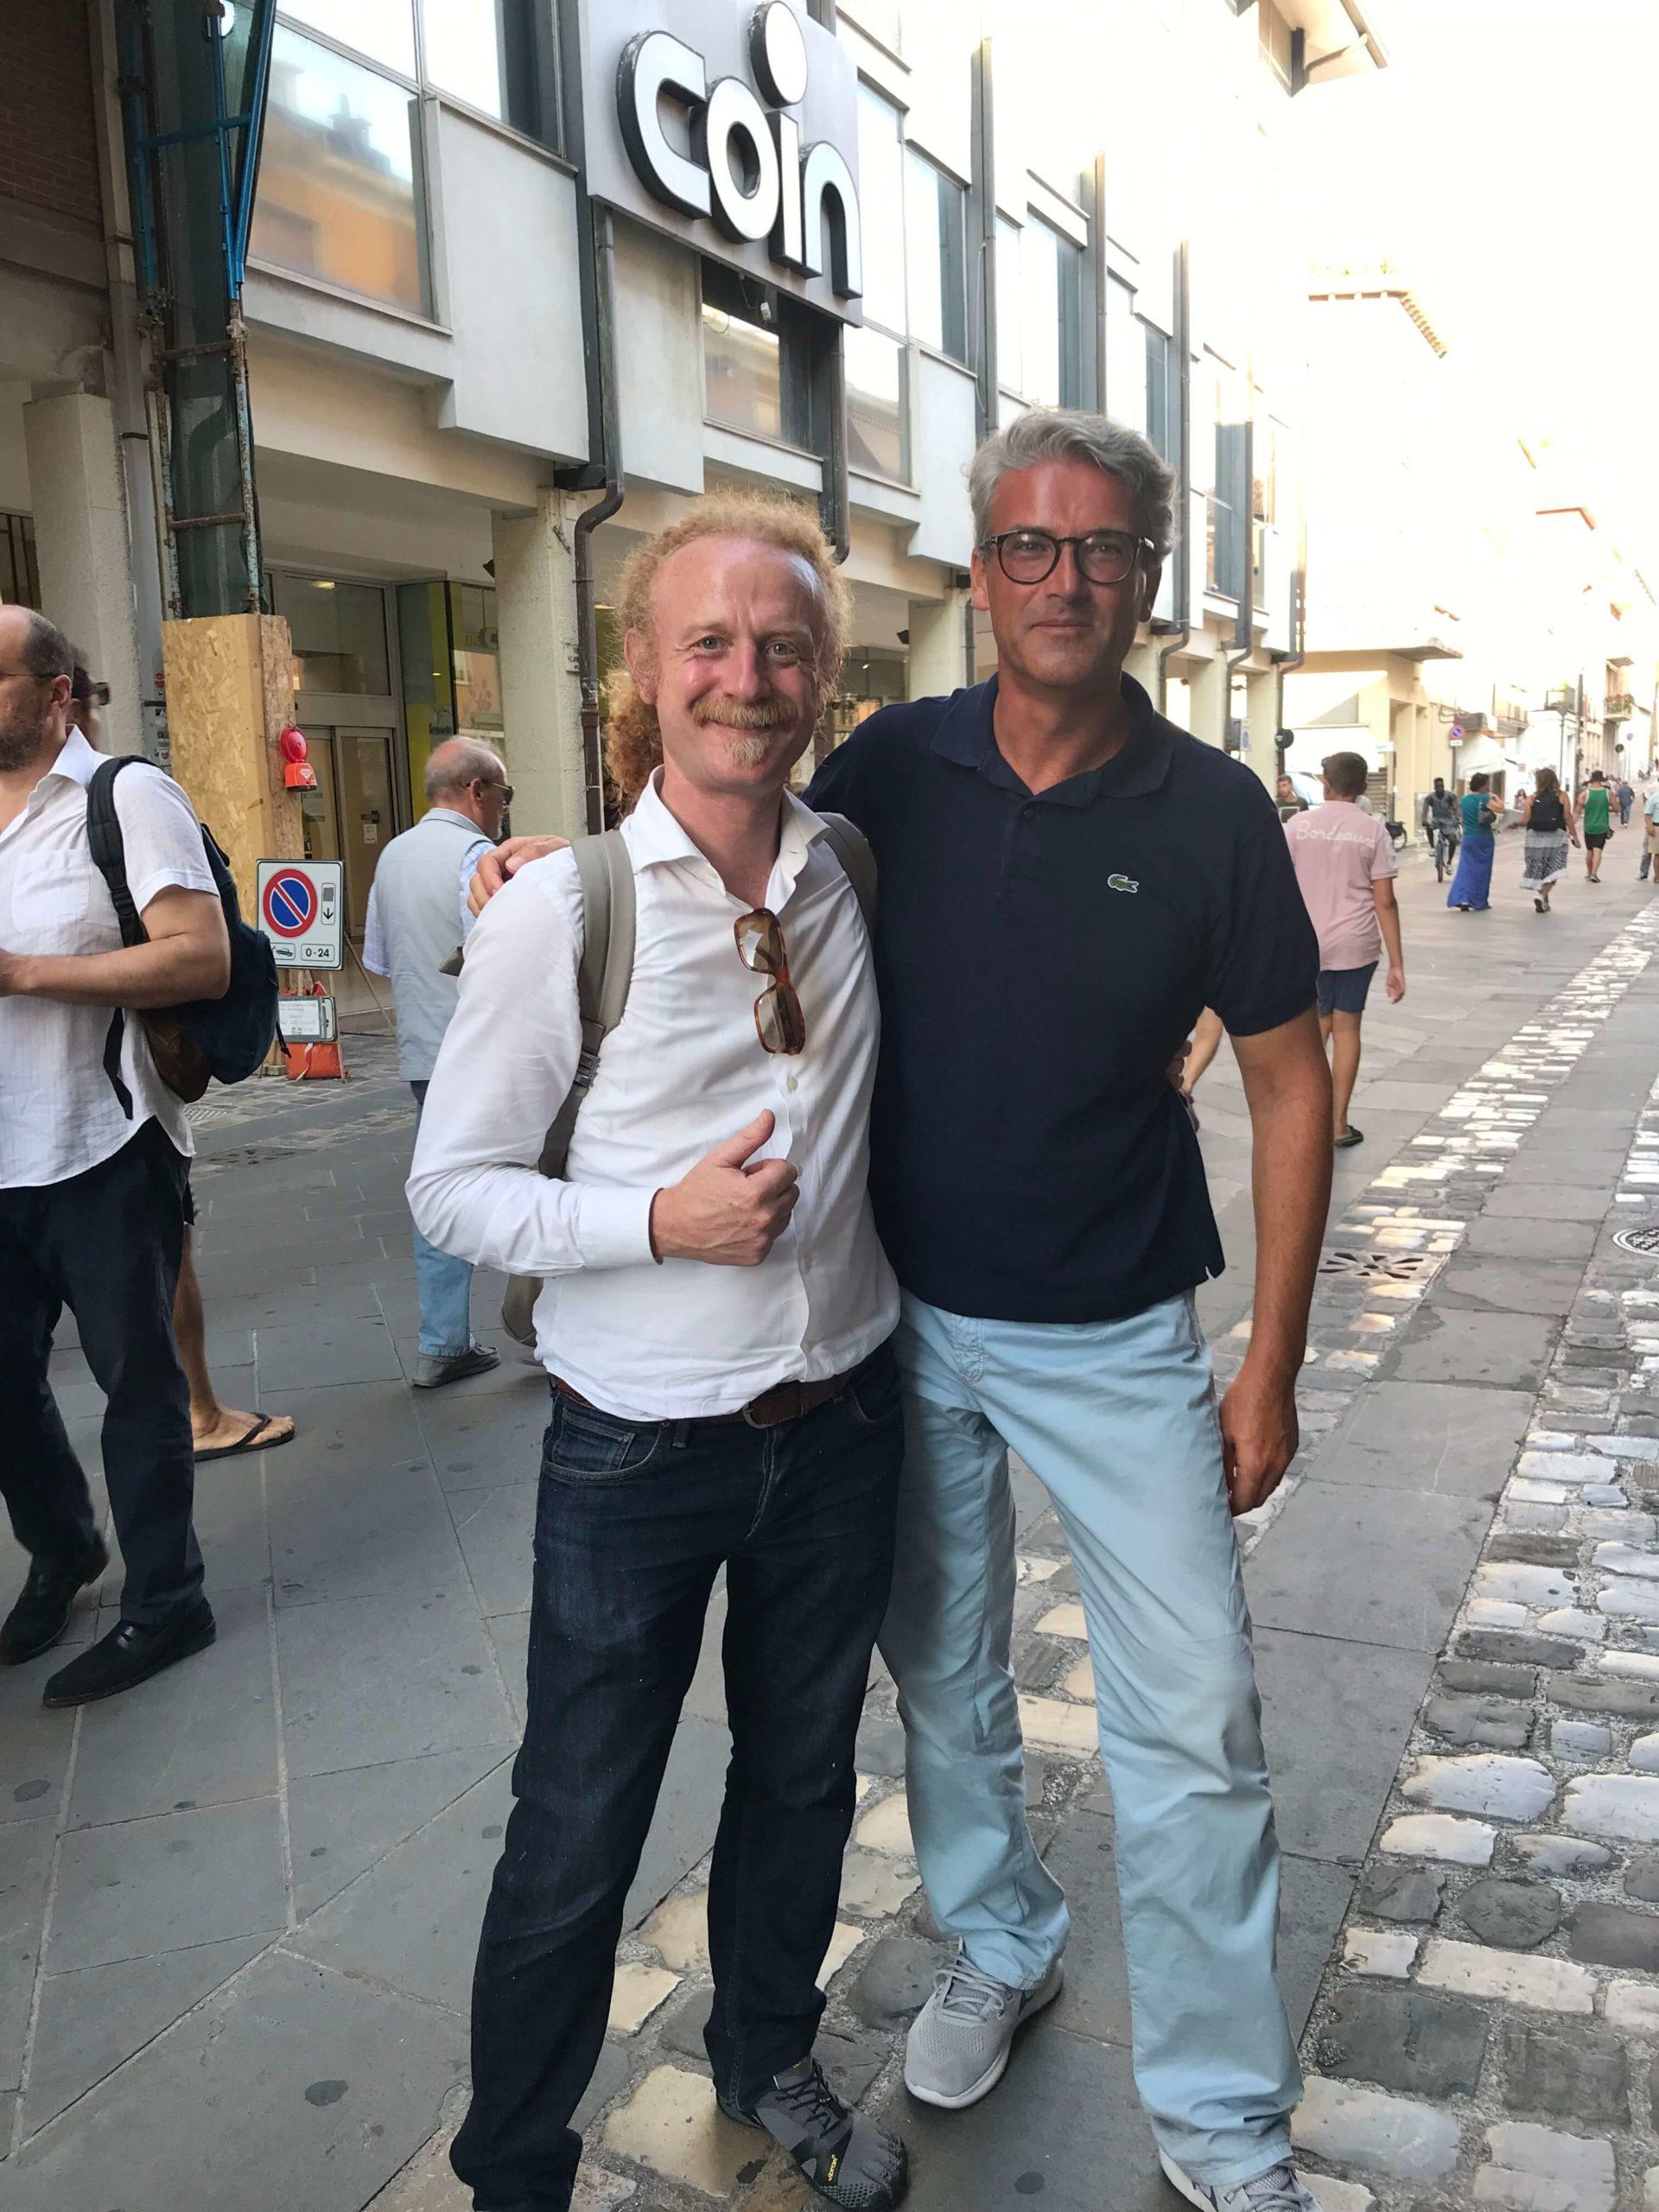 Massimiliano Montebelli YourBoost Start Up Innovativa e Ugo Mendes Donelli Business Model Canva